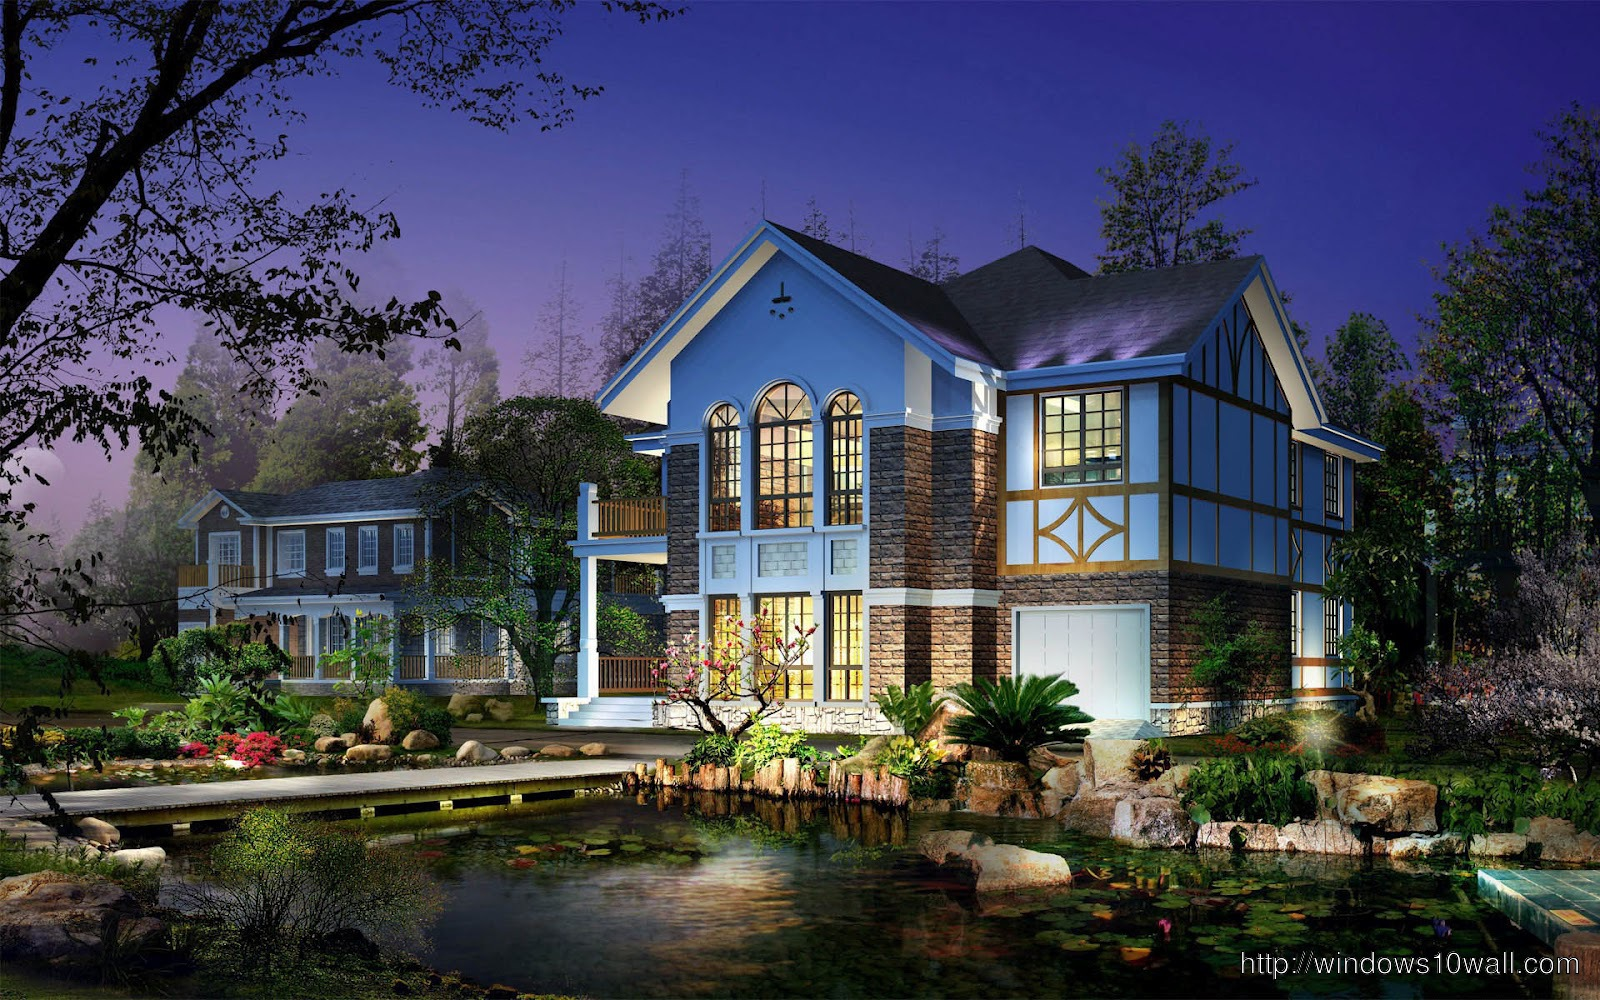 Best-top-desktop-3d-houses-hd-3d-homes-Wallpaper